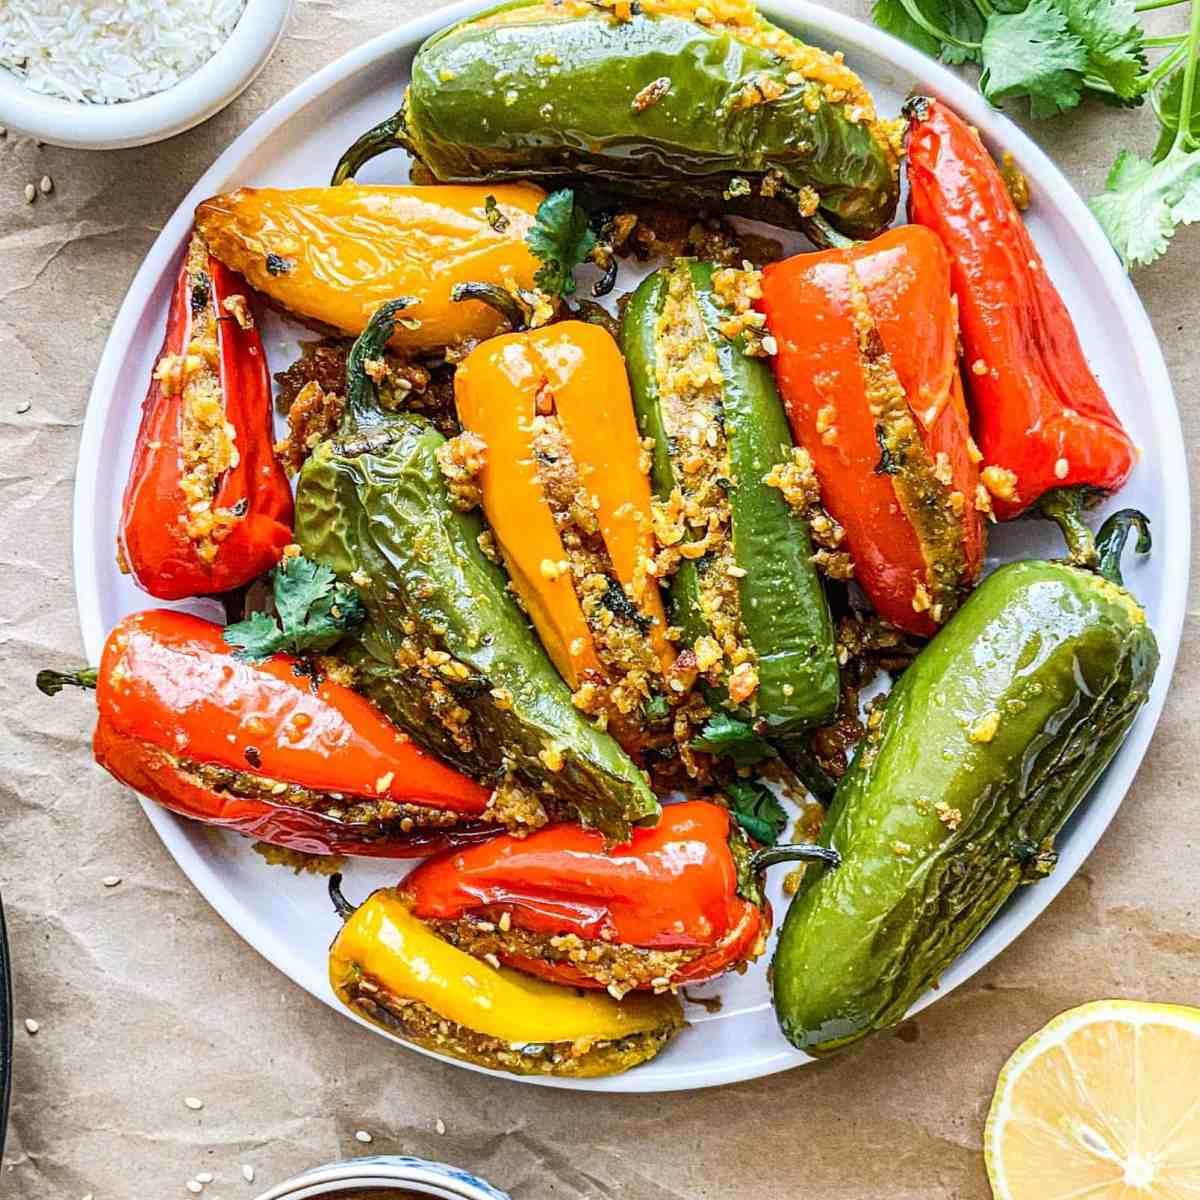 Gluten-free chickpea flour stuffed peppers